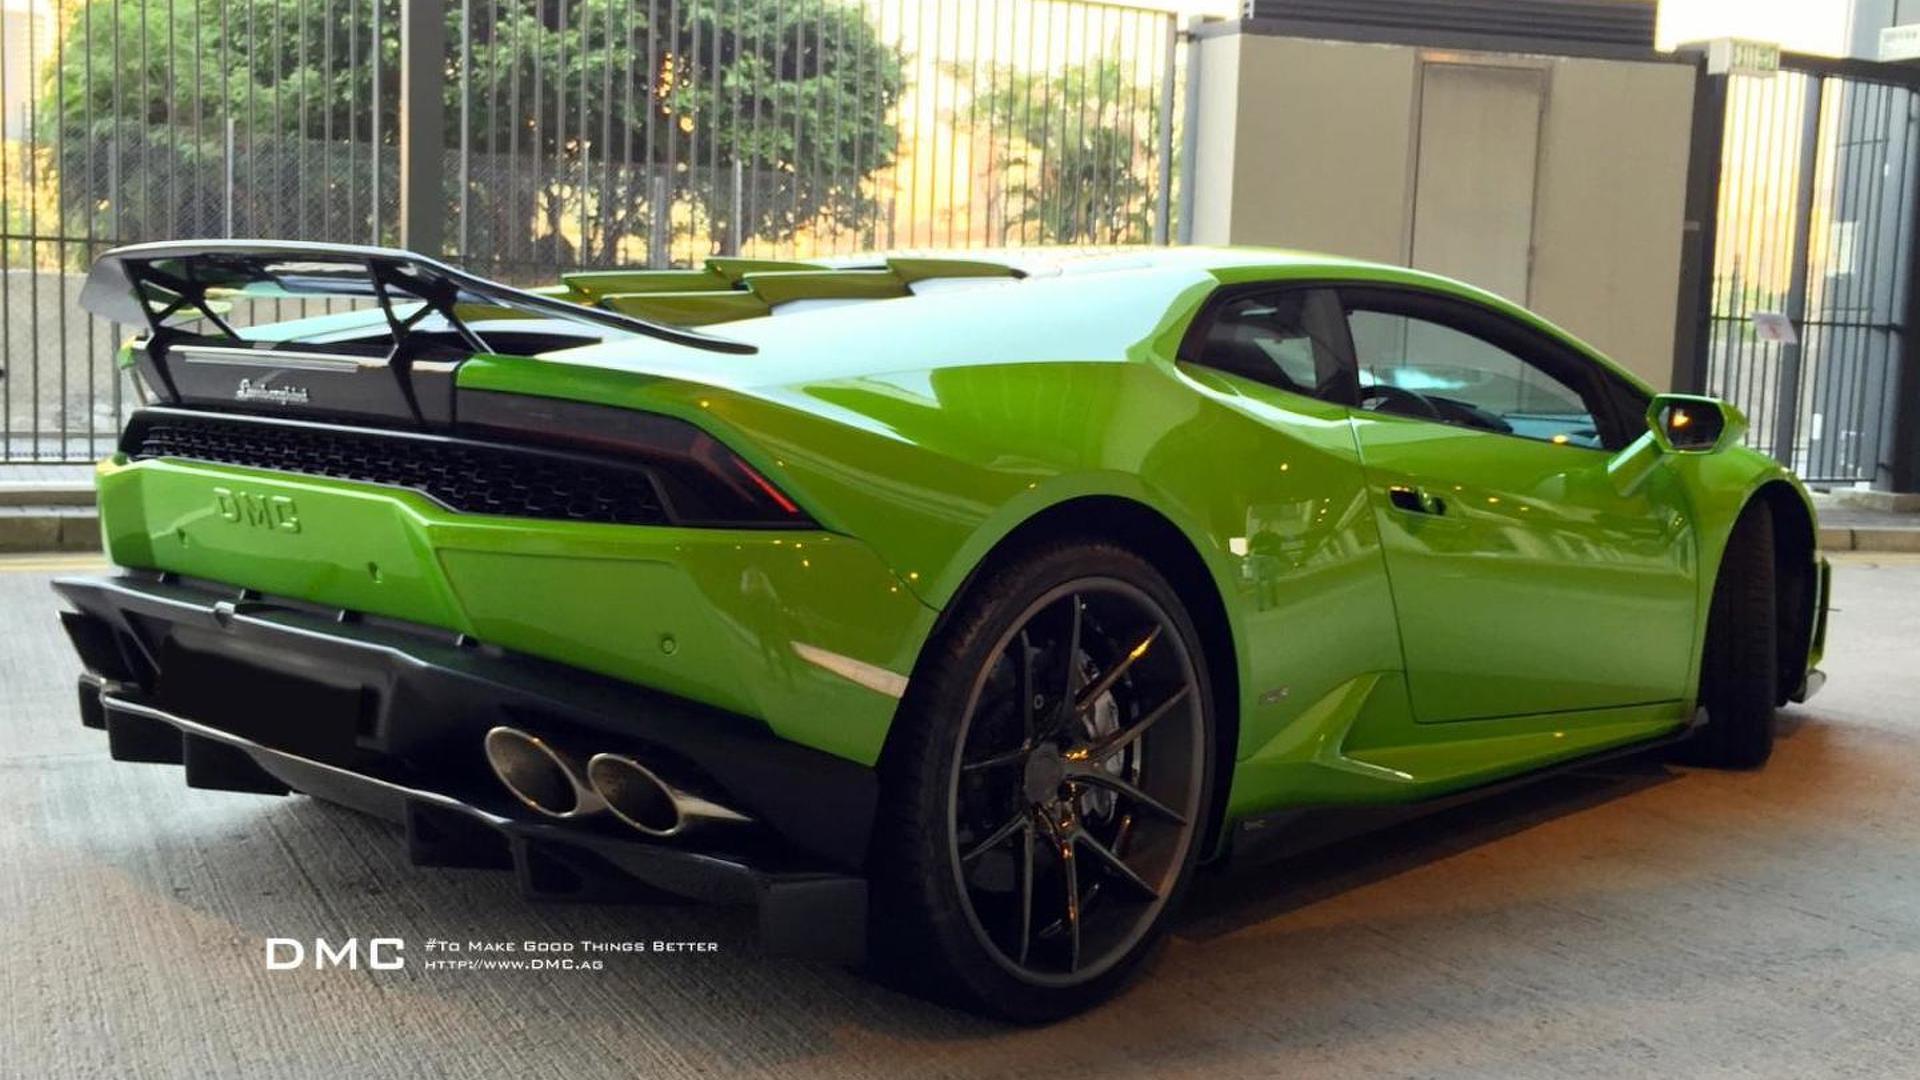 Суперкар Lamborghini Huracan Affari. Тюнинг от DMC